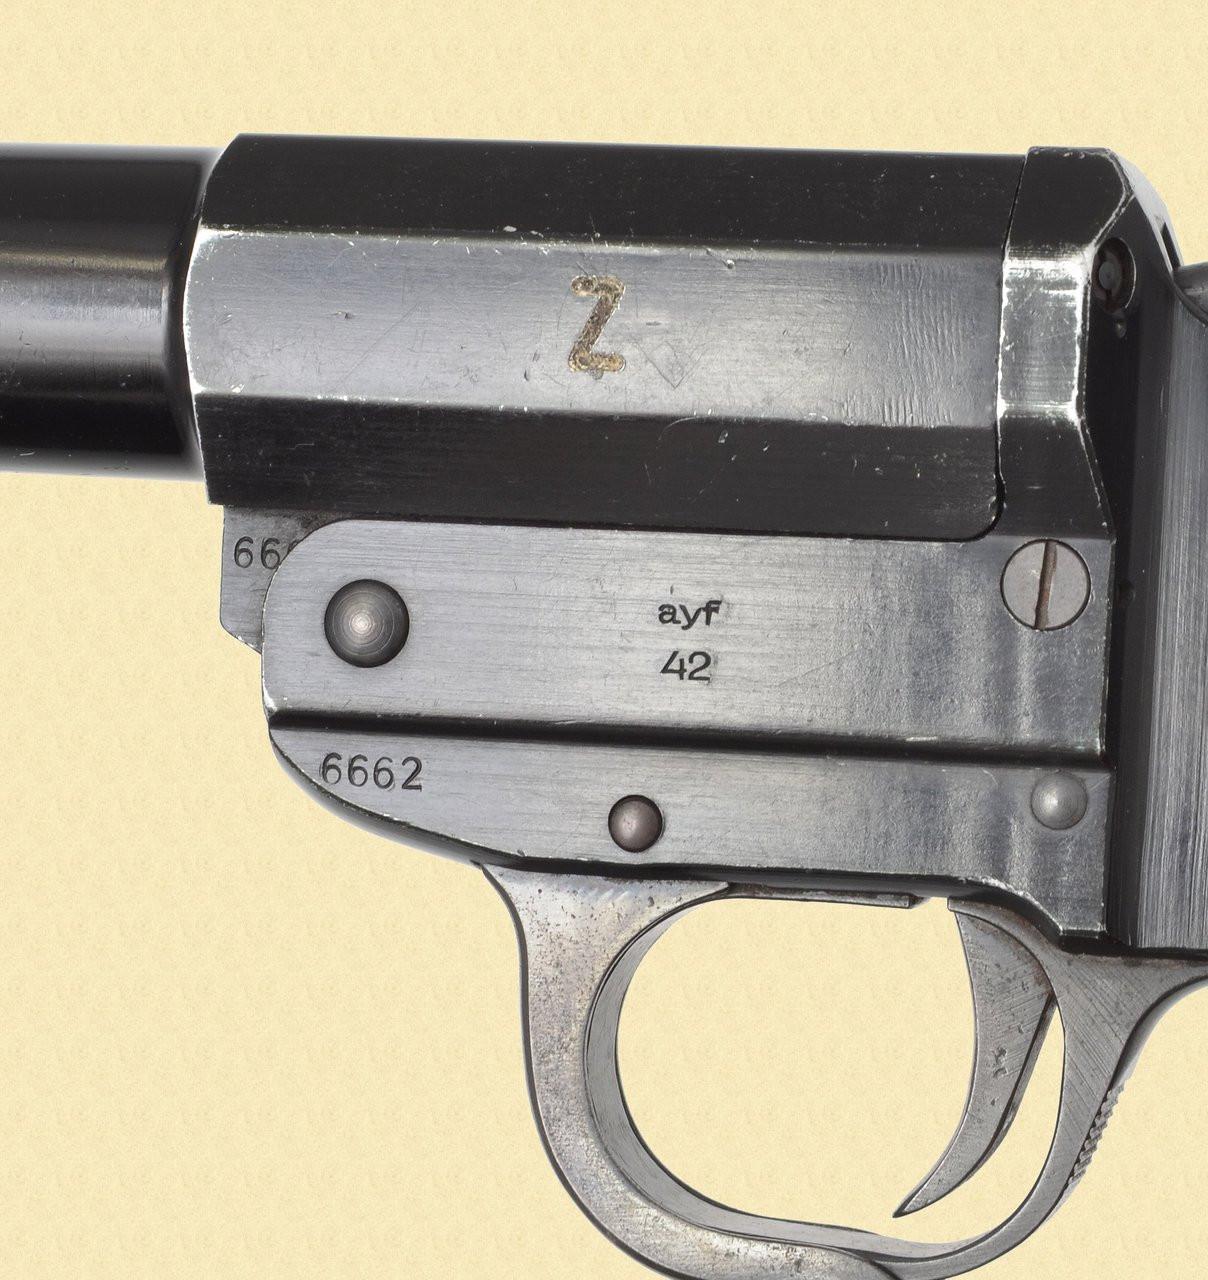 GERMANY NAZI MODEL Z FLAIR PISTOL - D15414